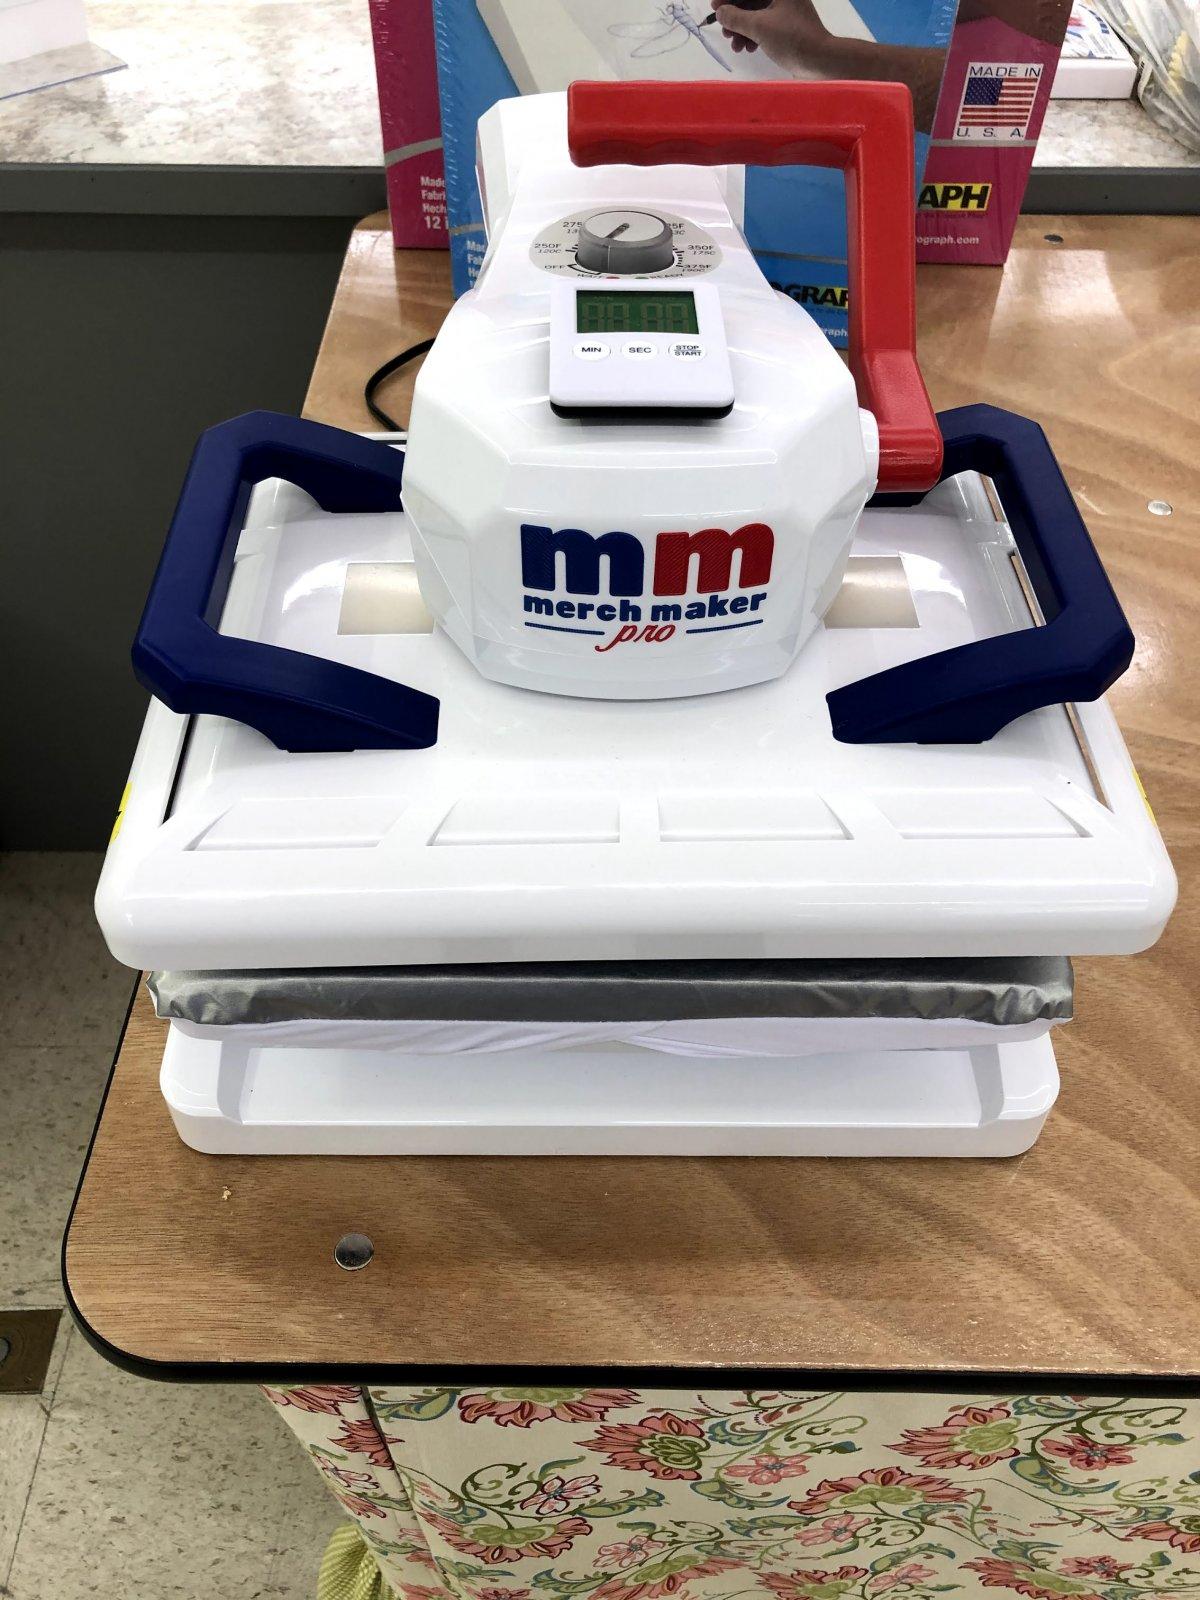 Merch Maker Pro Craft Heat Press